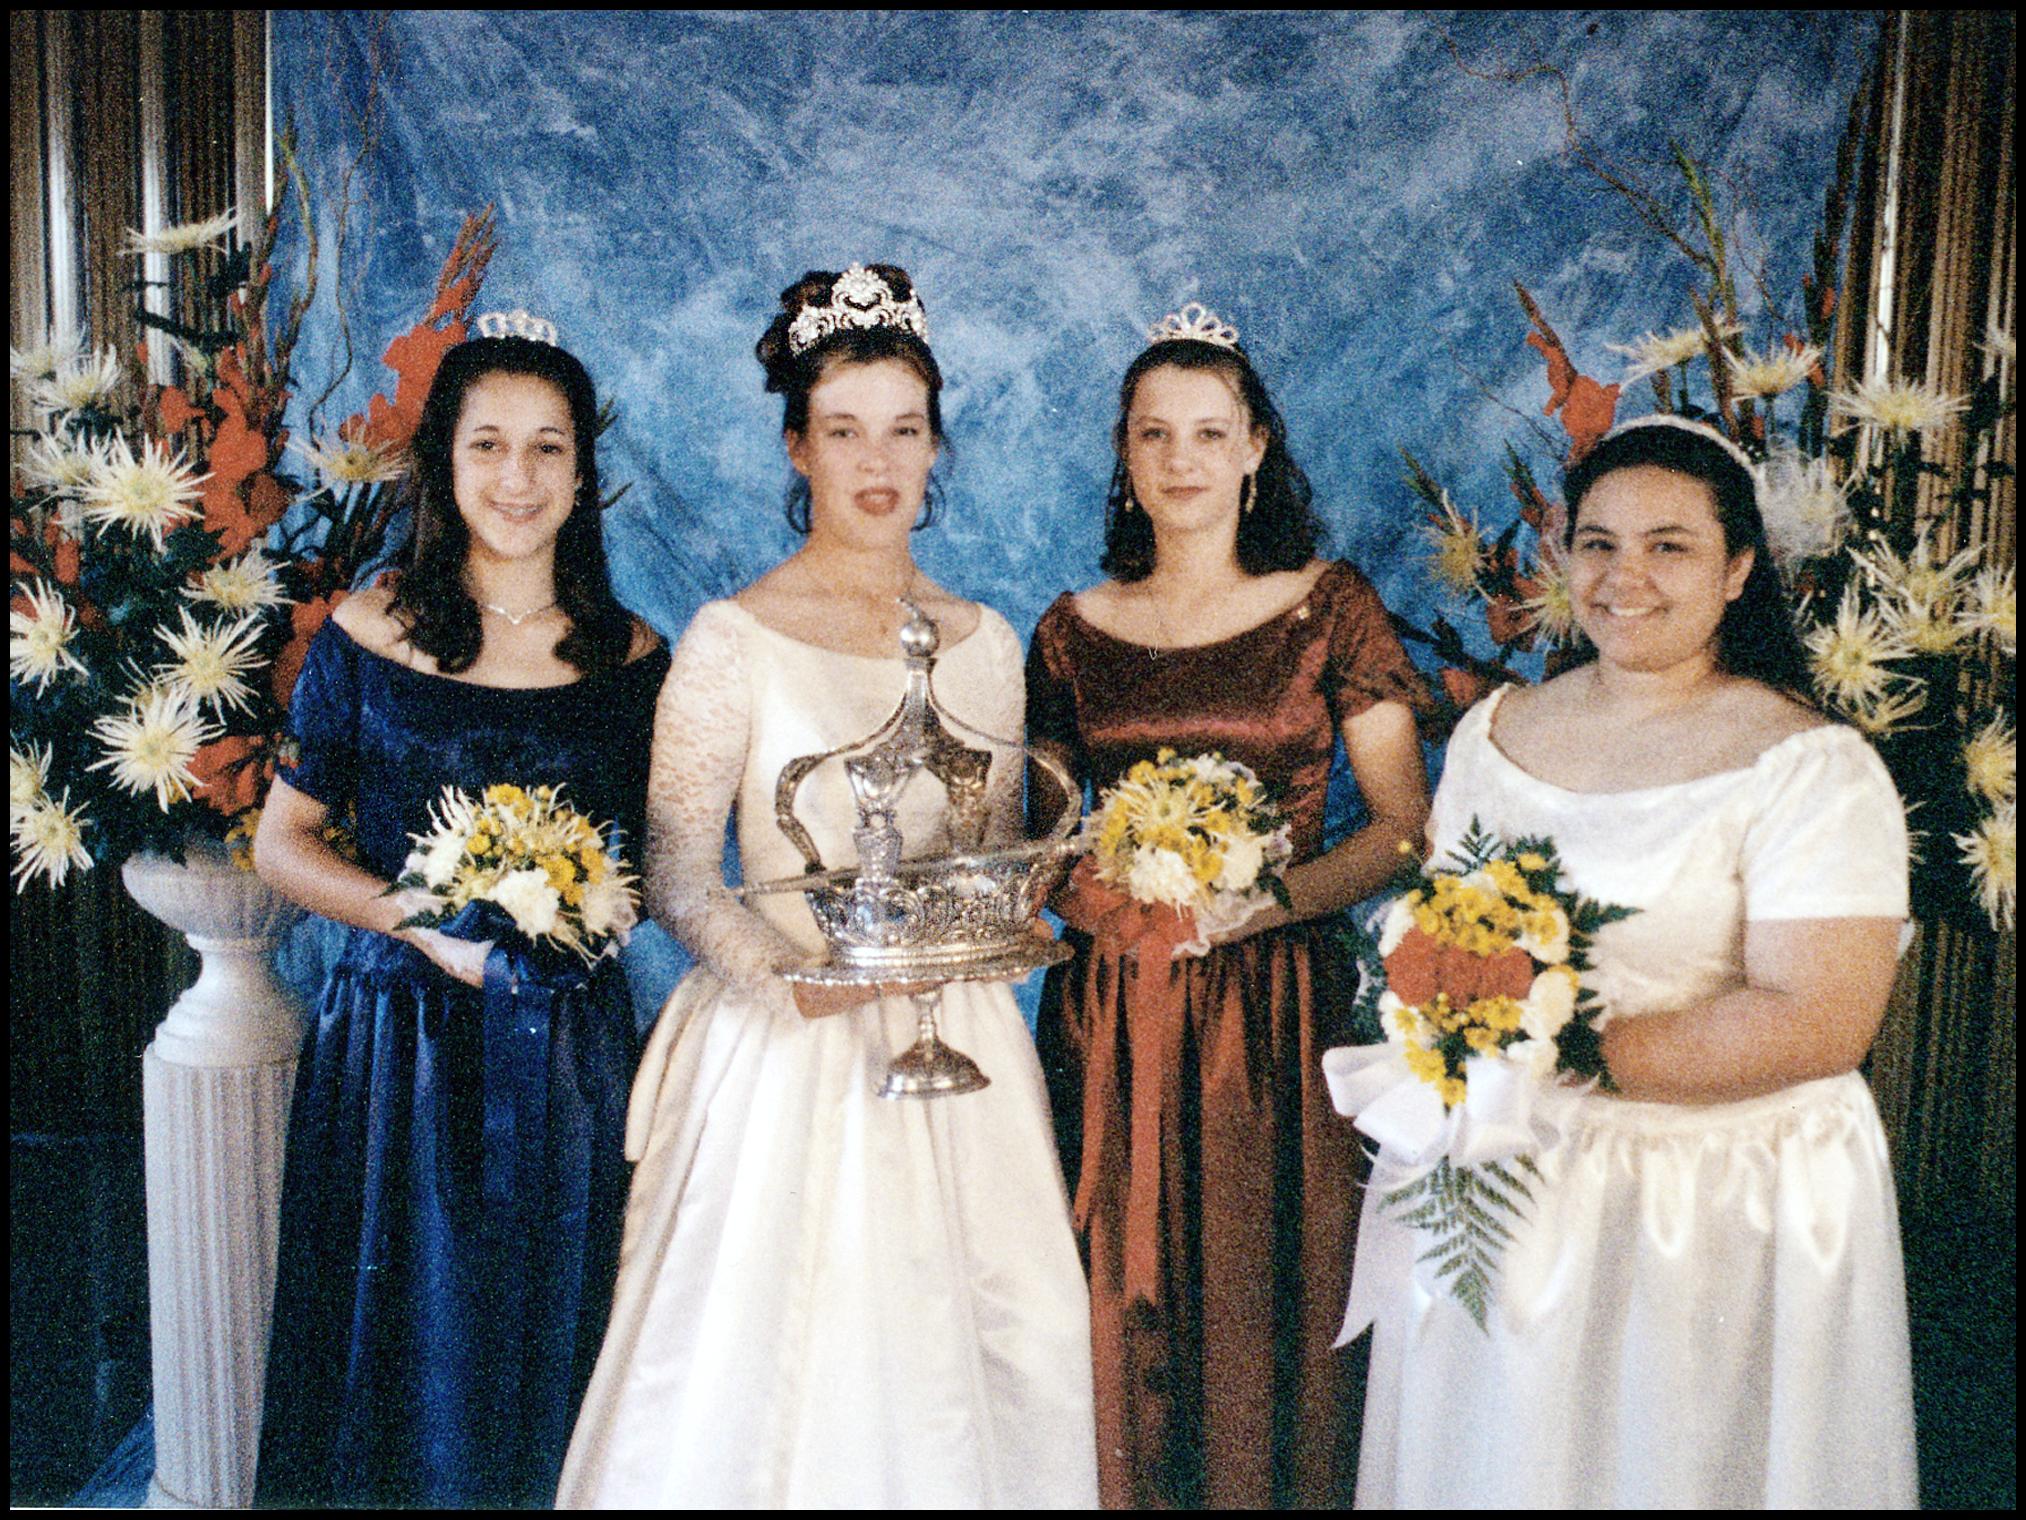 1 996 Festival Queen -  Kelli Cantlon Walden    Sidemaids - Amanda Montiero & Jessica Marin